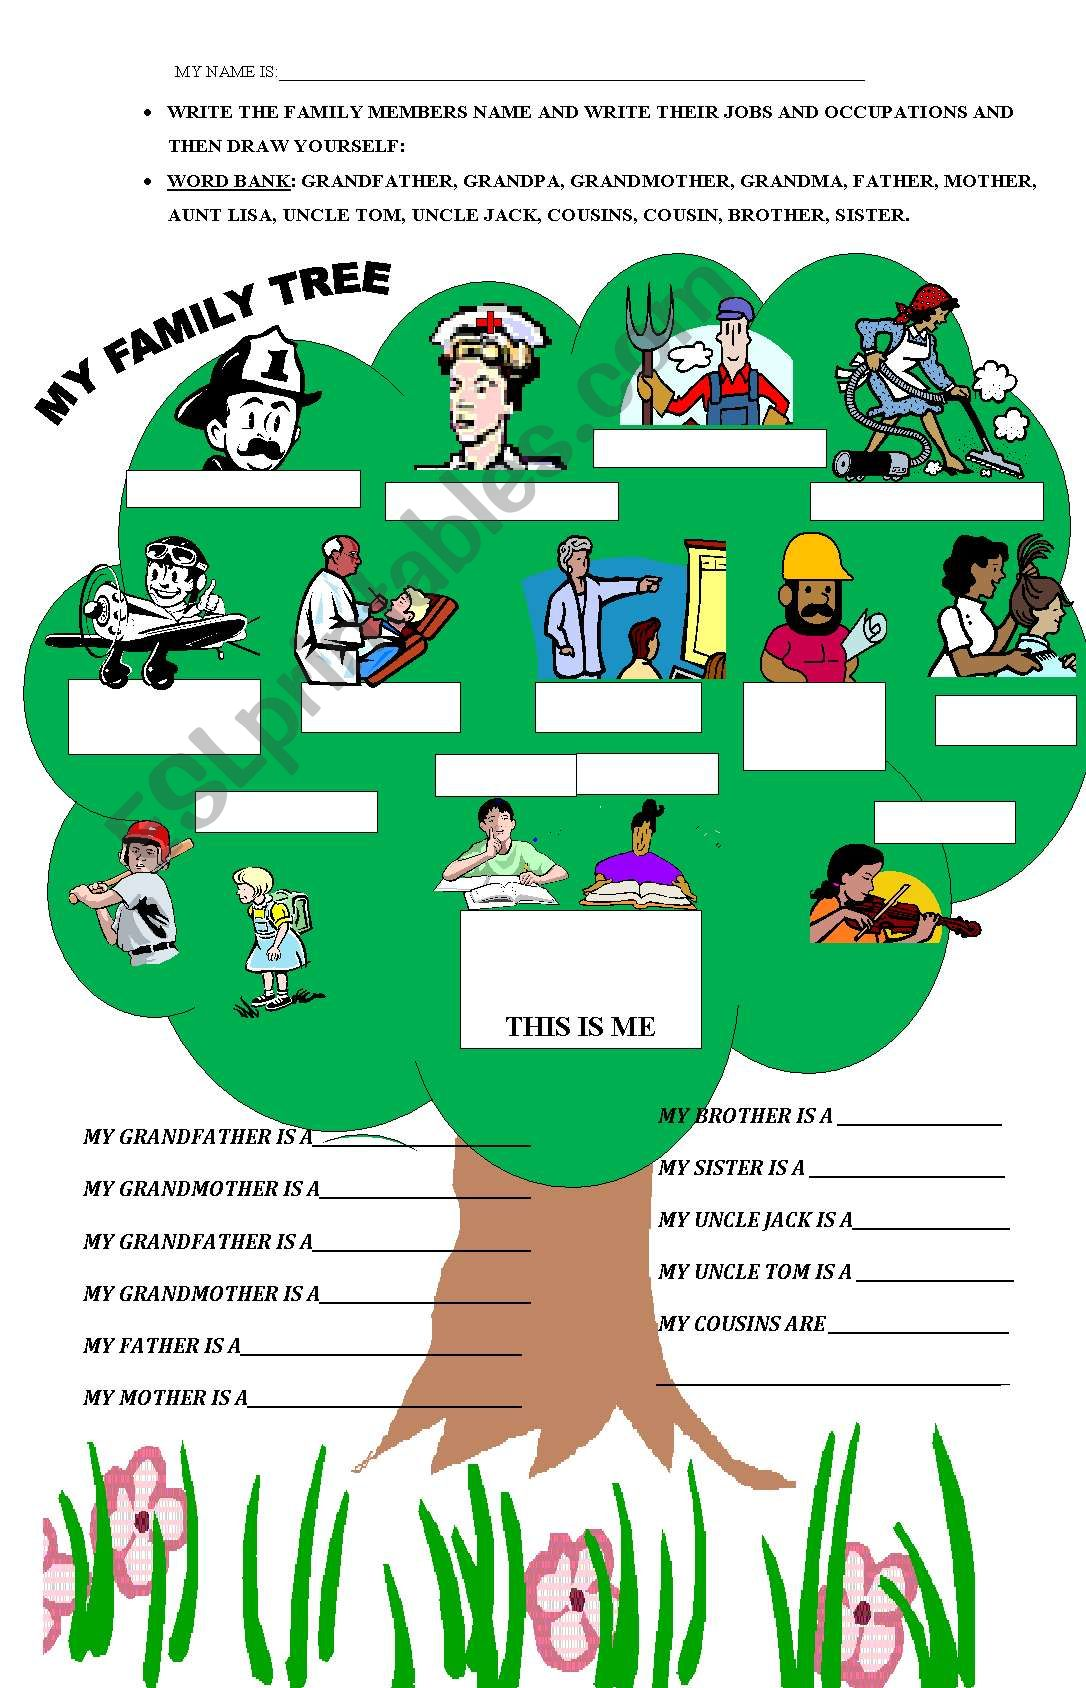 Family Tree With Jobs